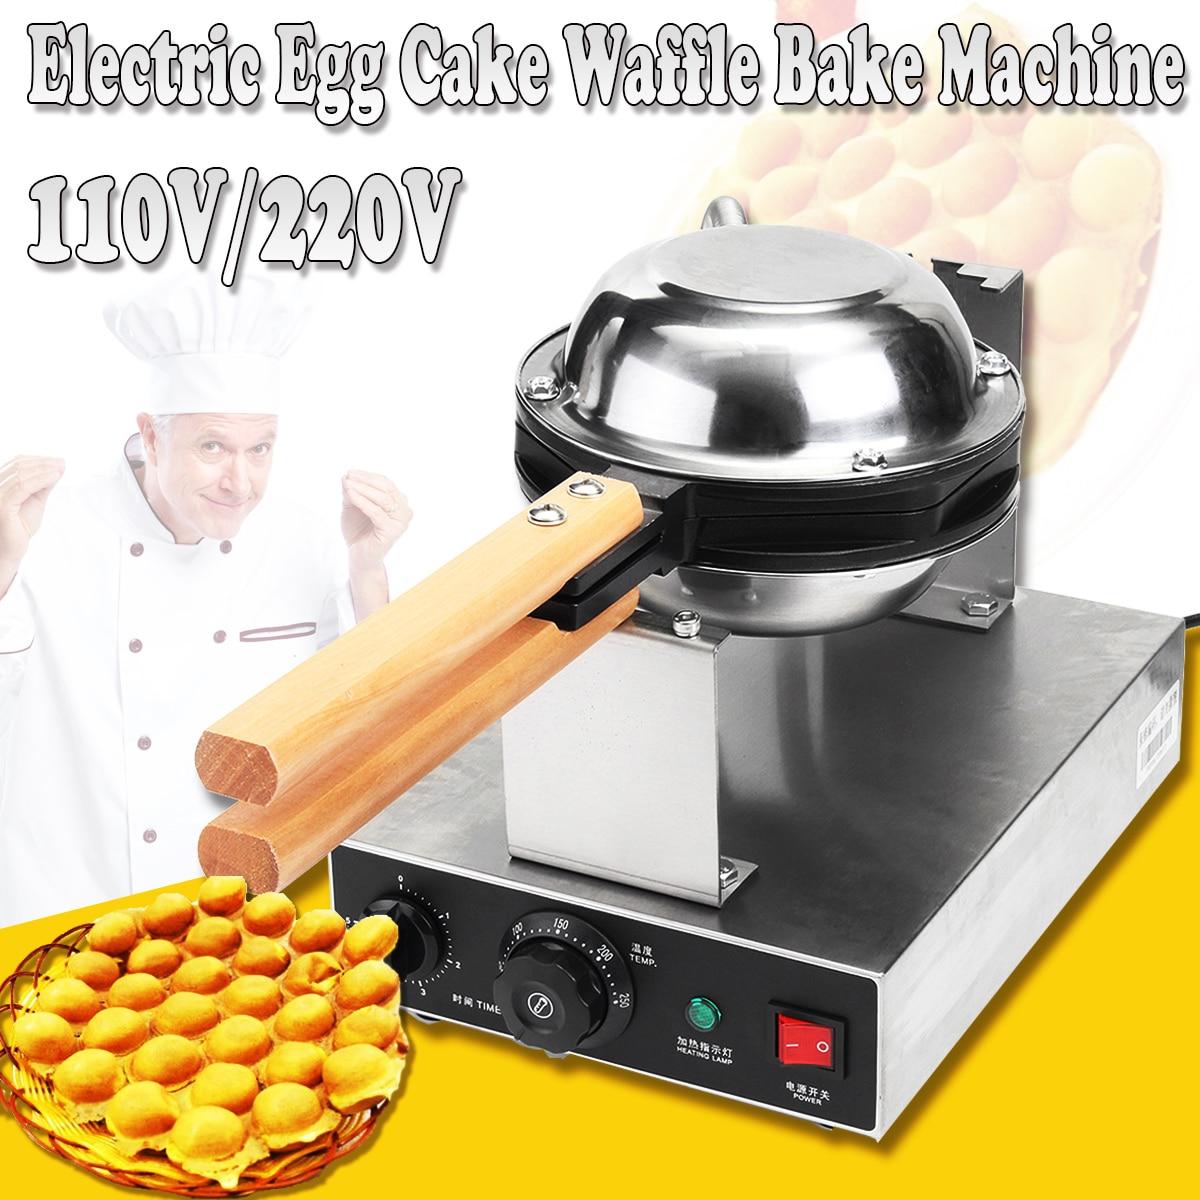 110V/220V Stainless Steel Electric Egg Cake Oven Puff Bread Waffle Bake Machine цена